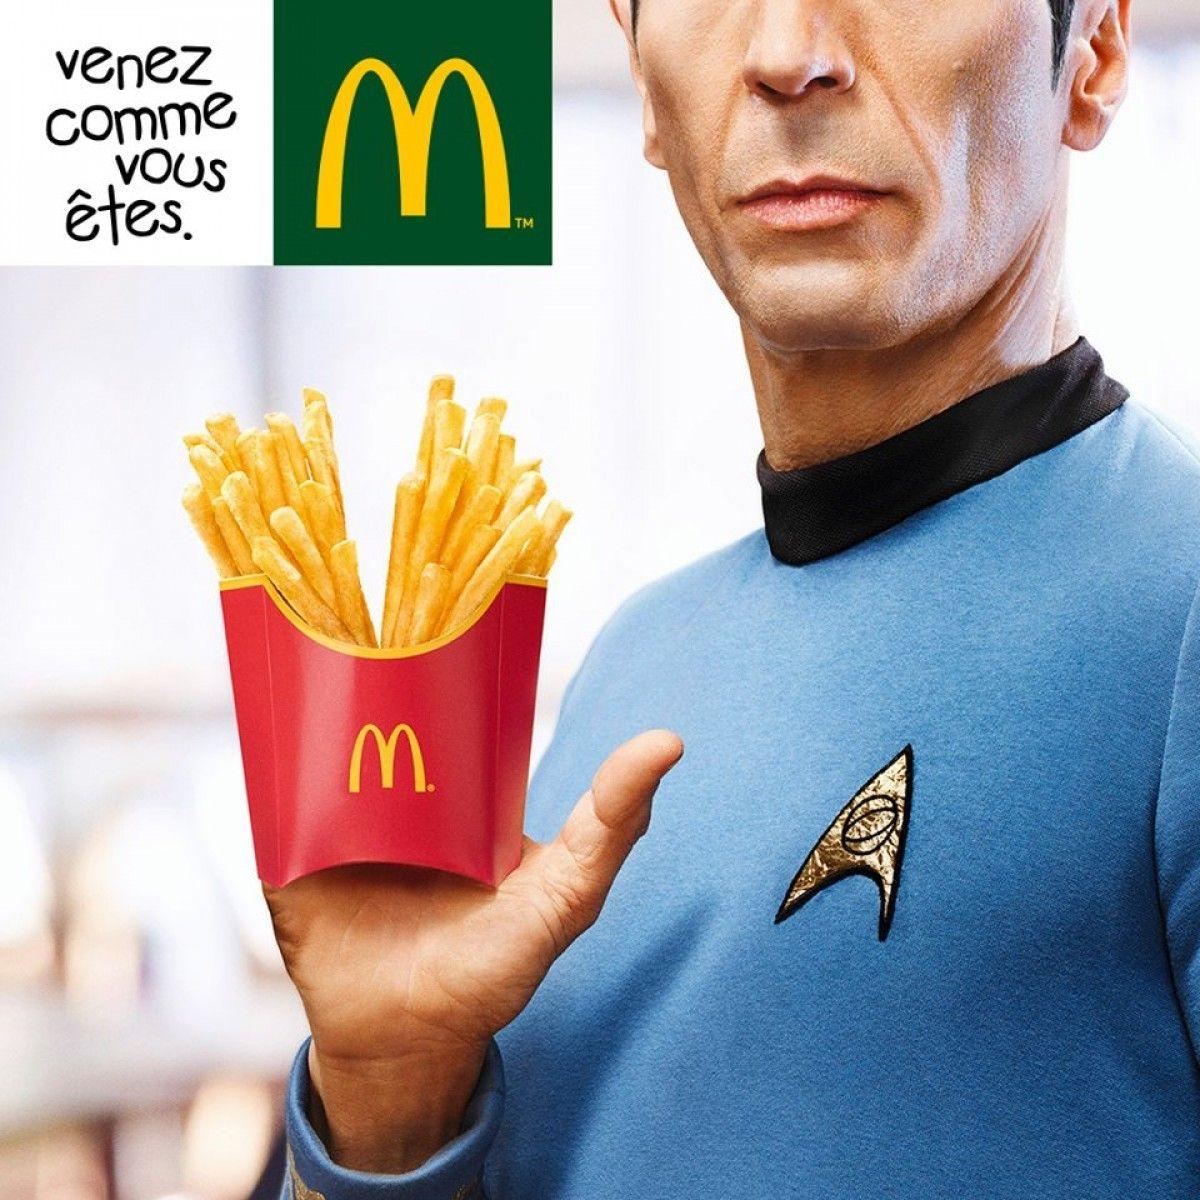 Pubs McDonald's avec nos personnages de jeux vidéo Bb0c04abc3bd767d1dda6ee1124aa93a